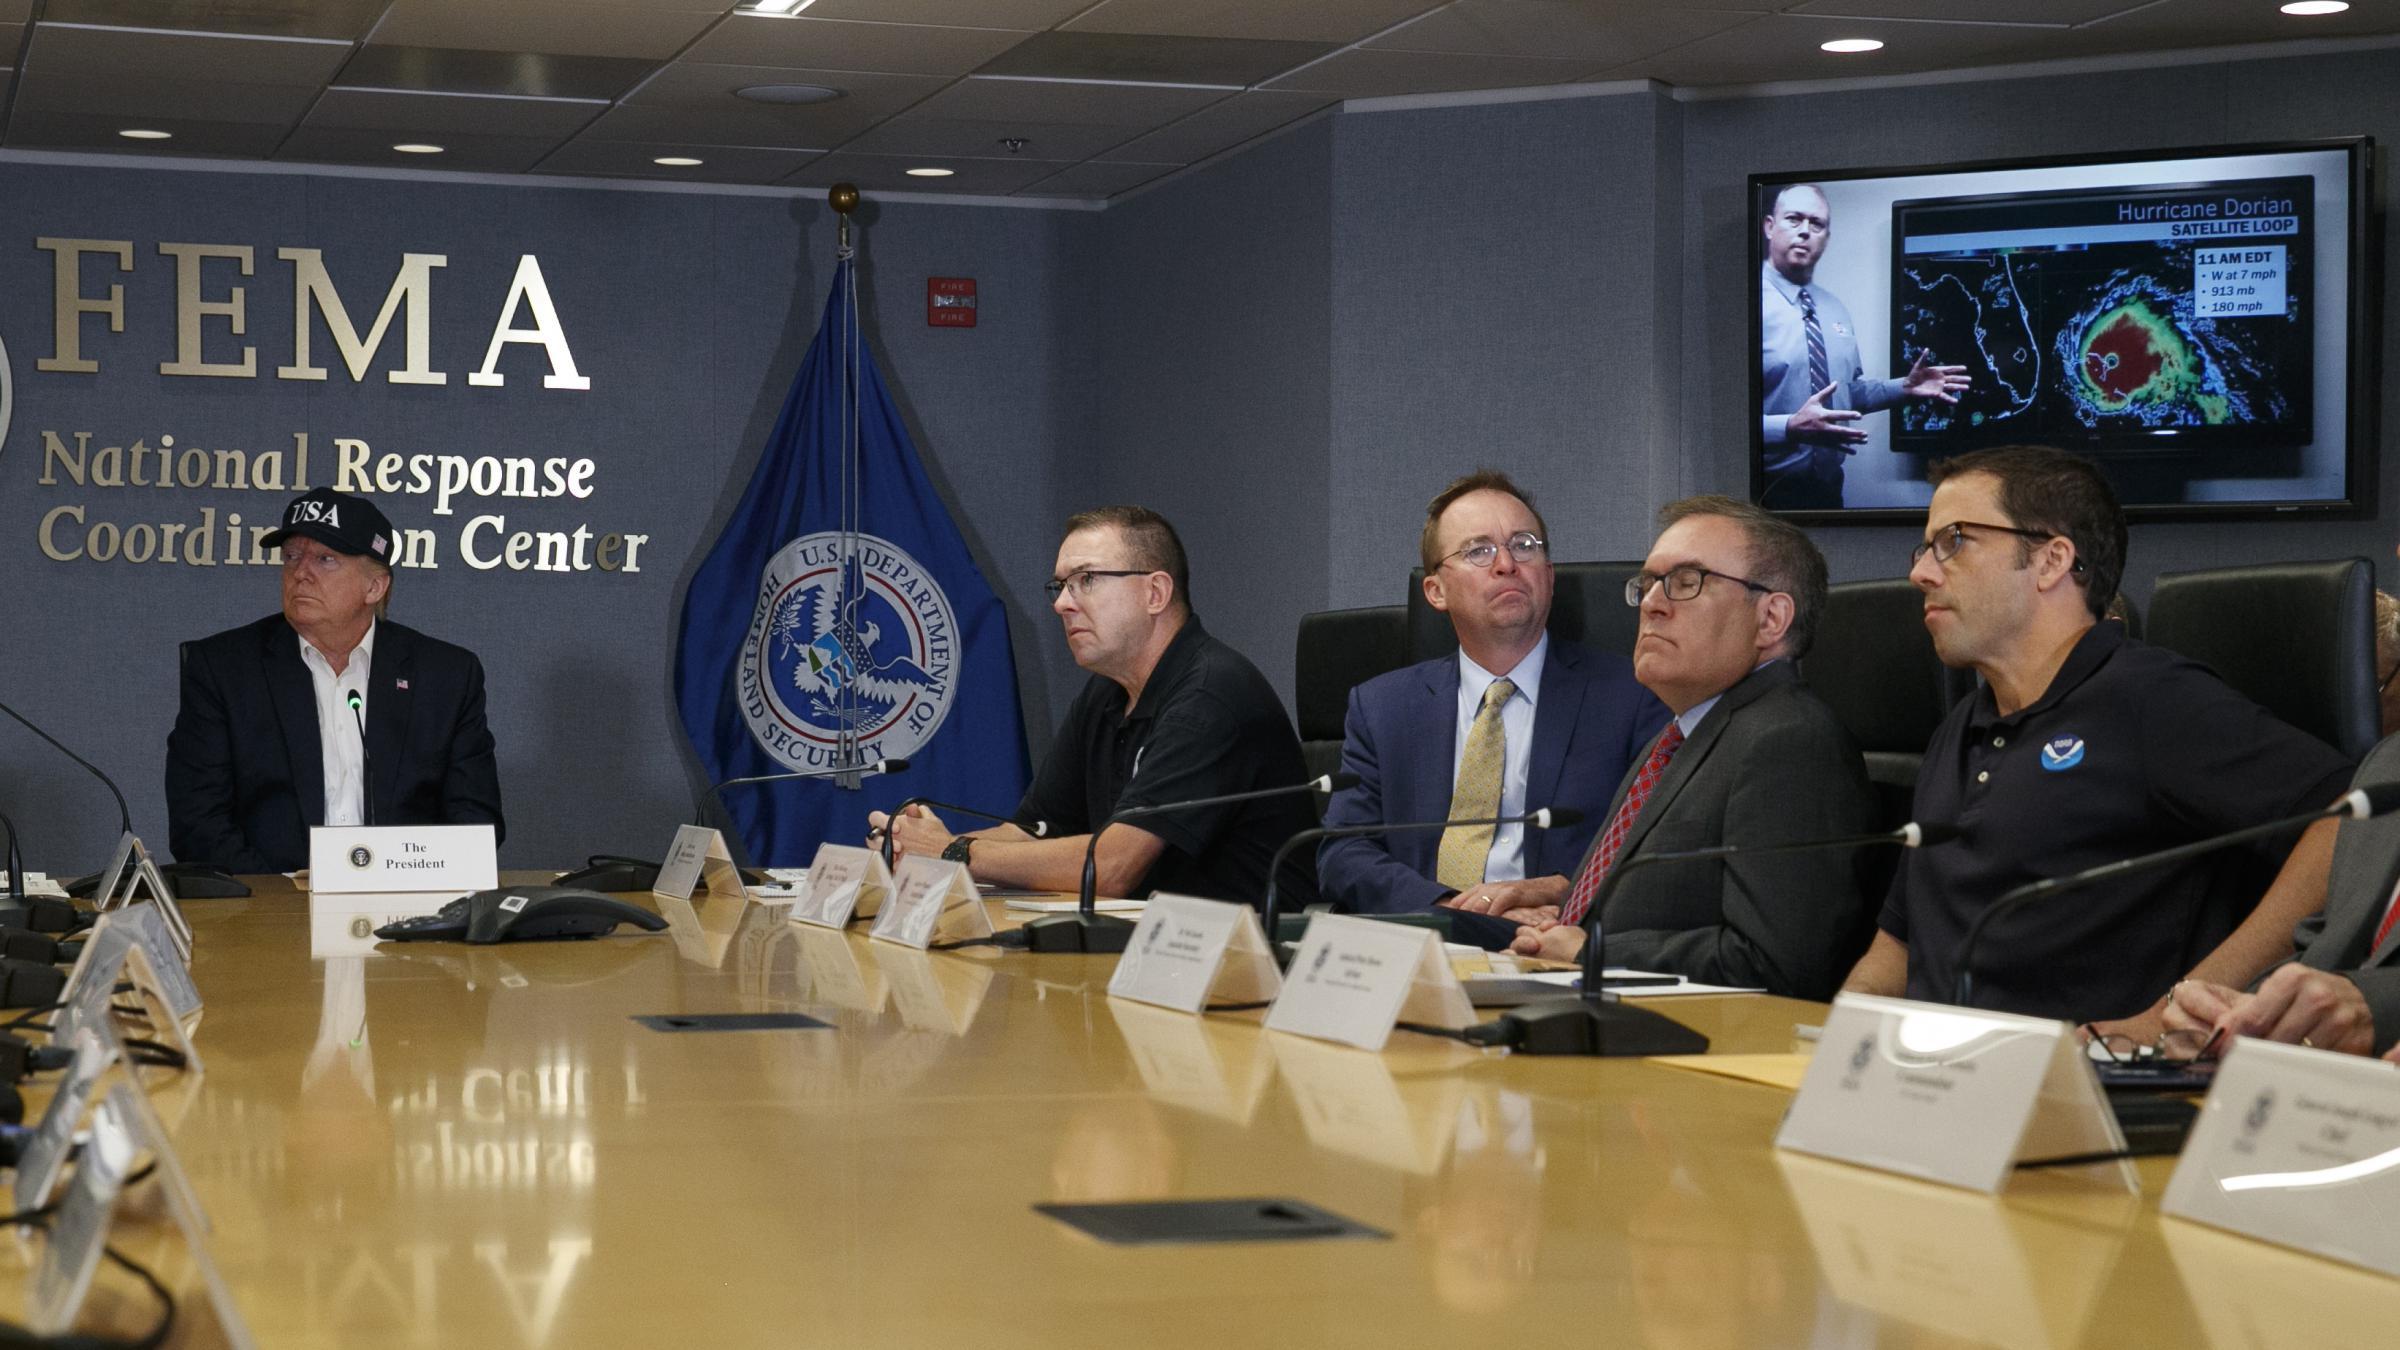 Lead NOAA scientist vows to probe agency's defense of Trump